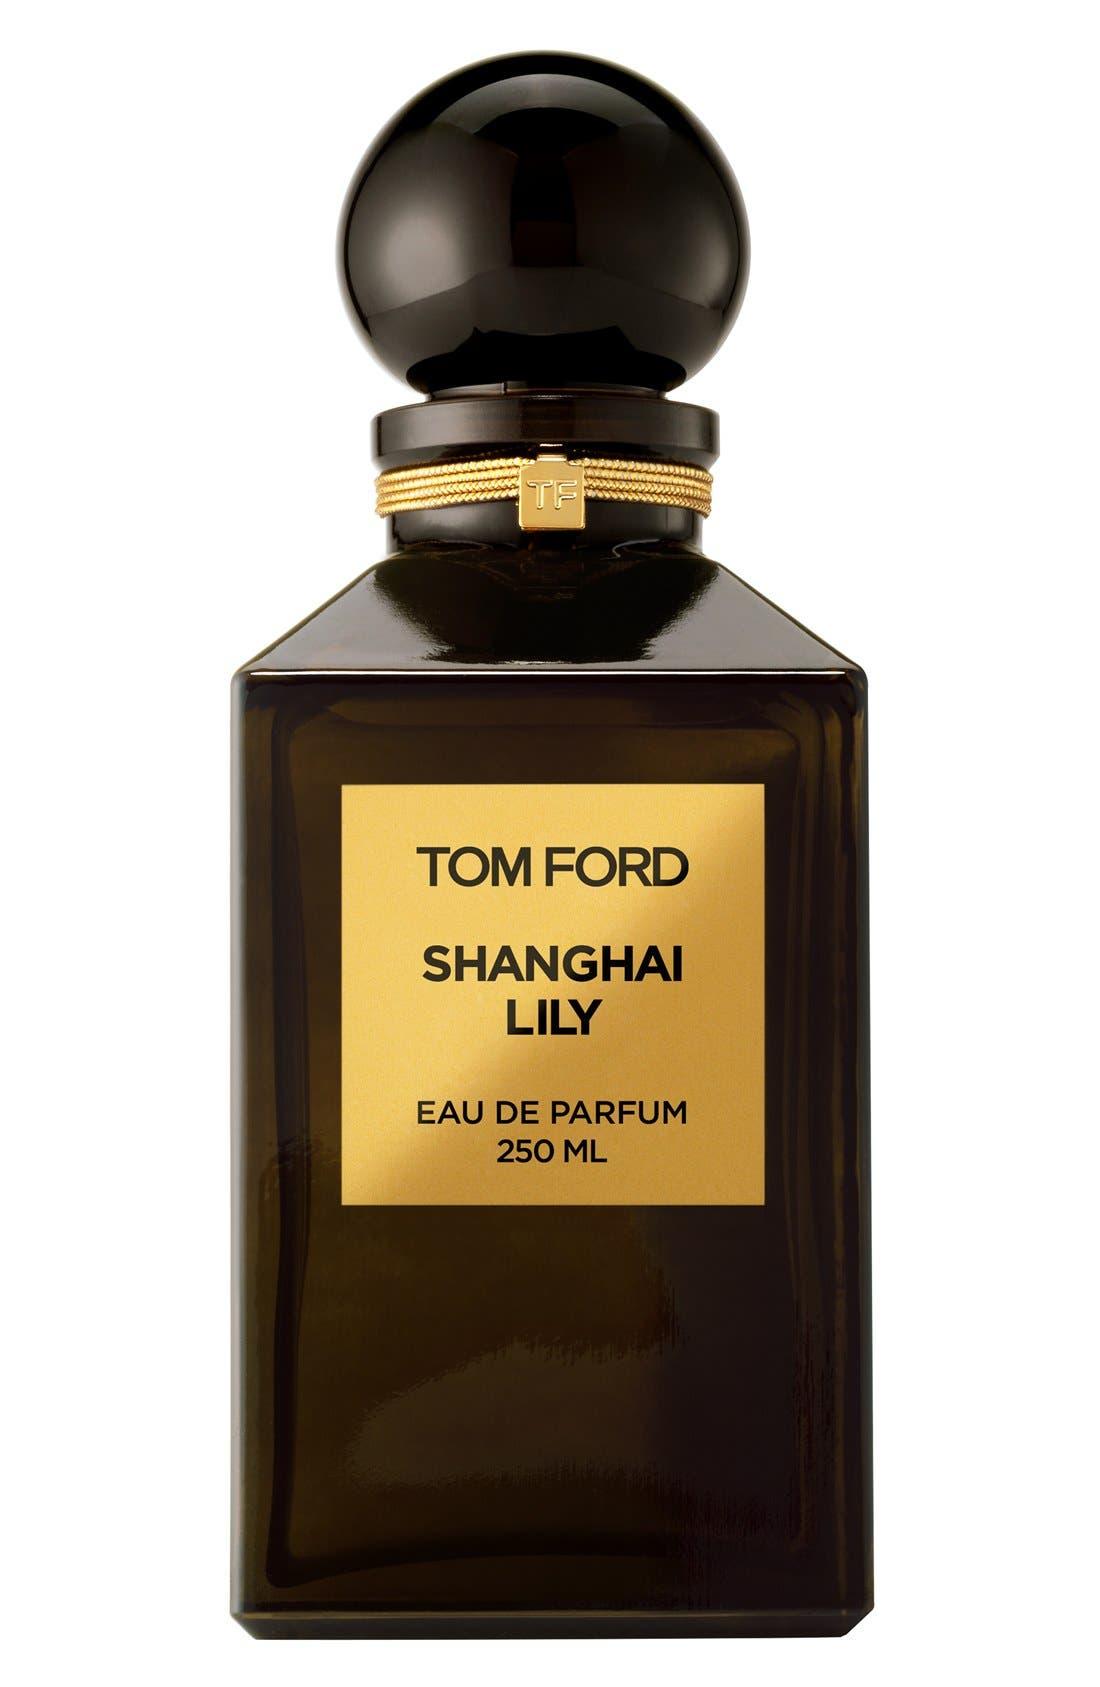 Tom Ford Private Blend Shanghai Lily Eau de Parfum Decanter